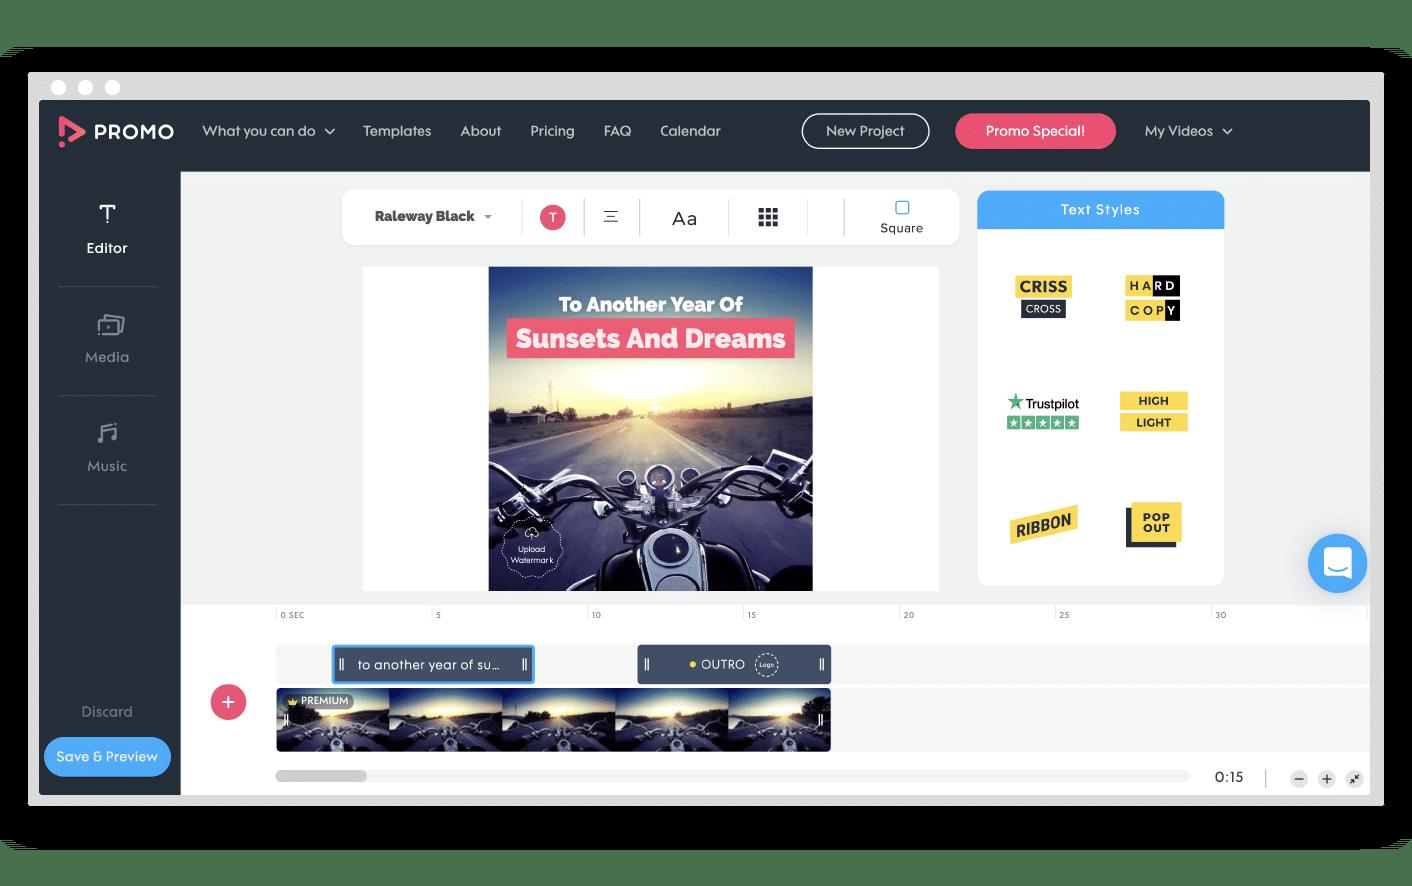 Promo.com Video Editor